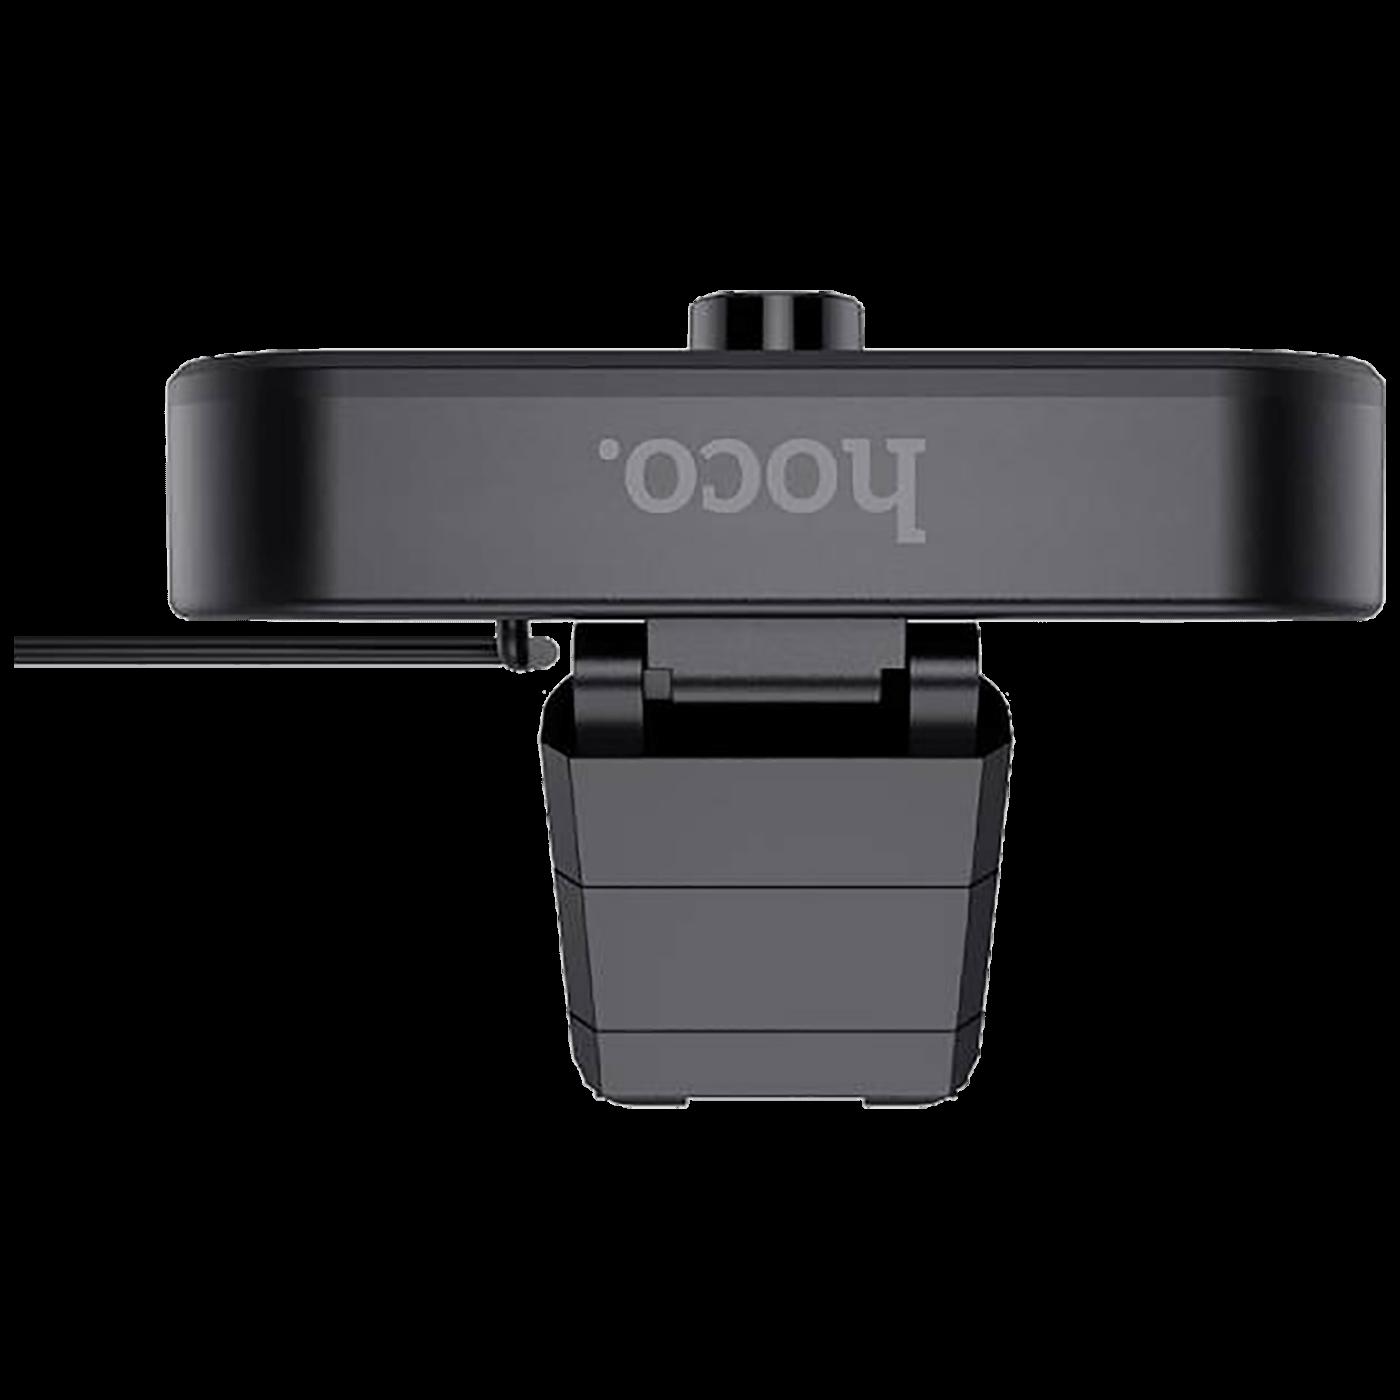 Web kamera sa mikrofonom, 1080p, USB